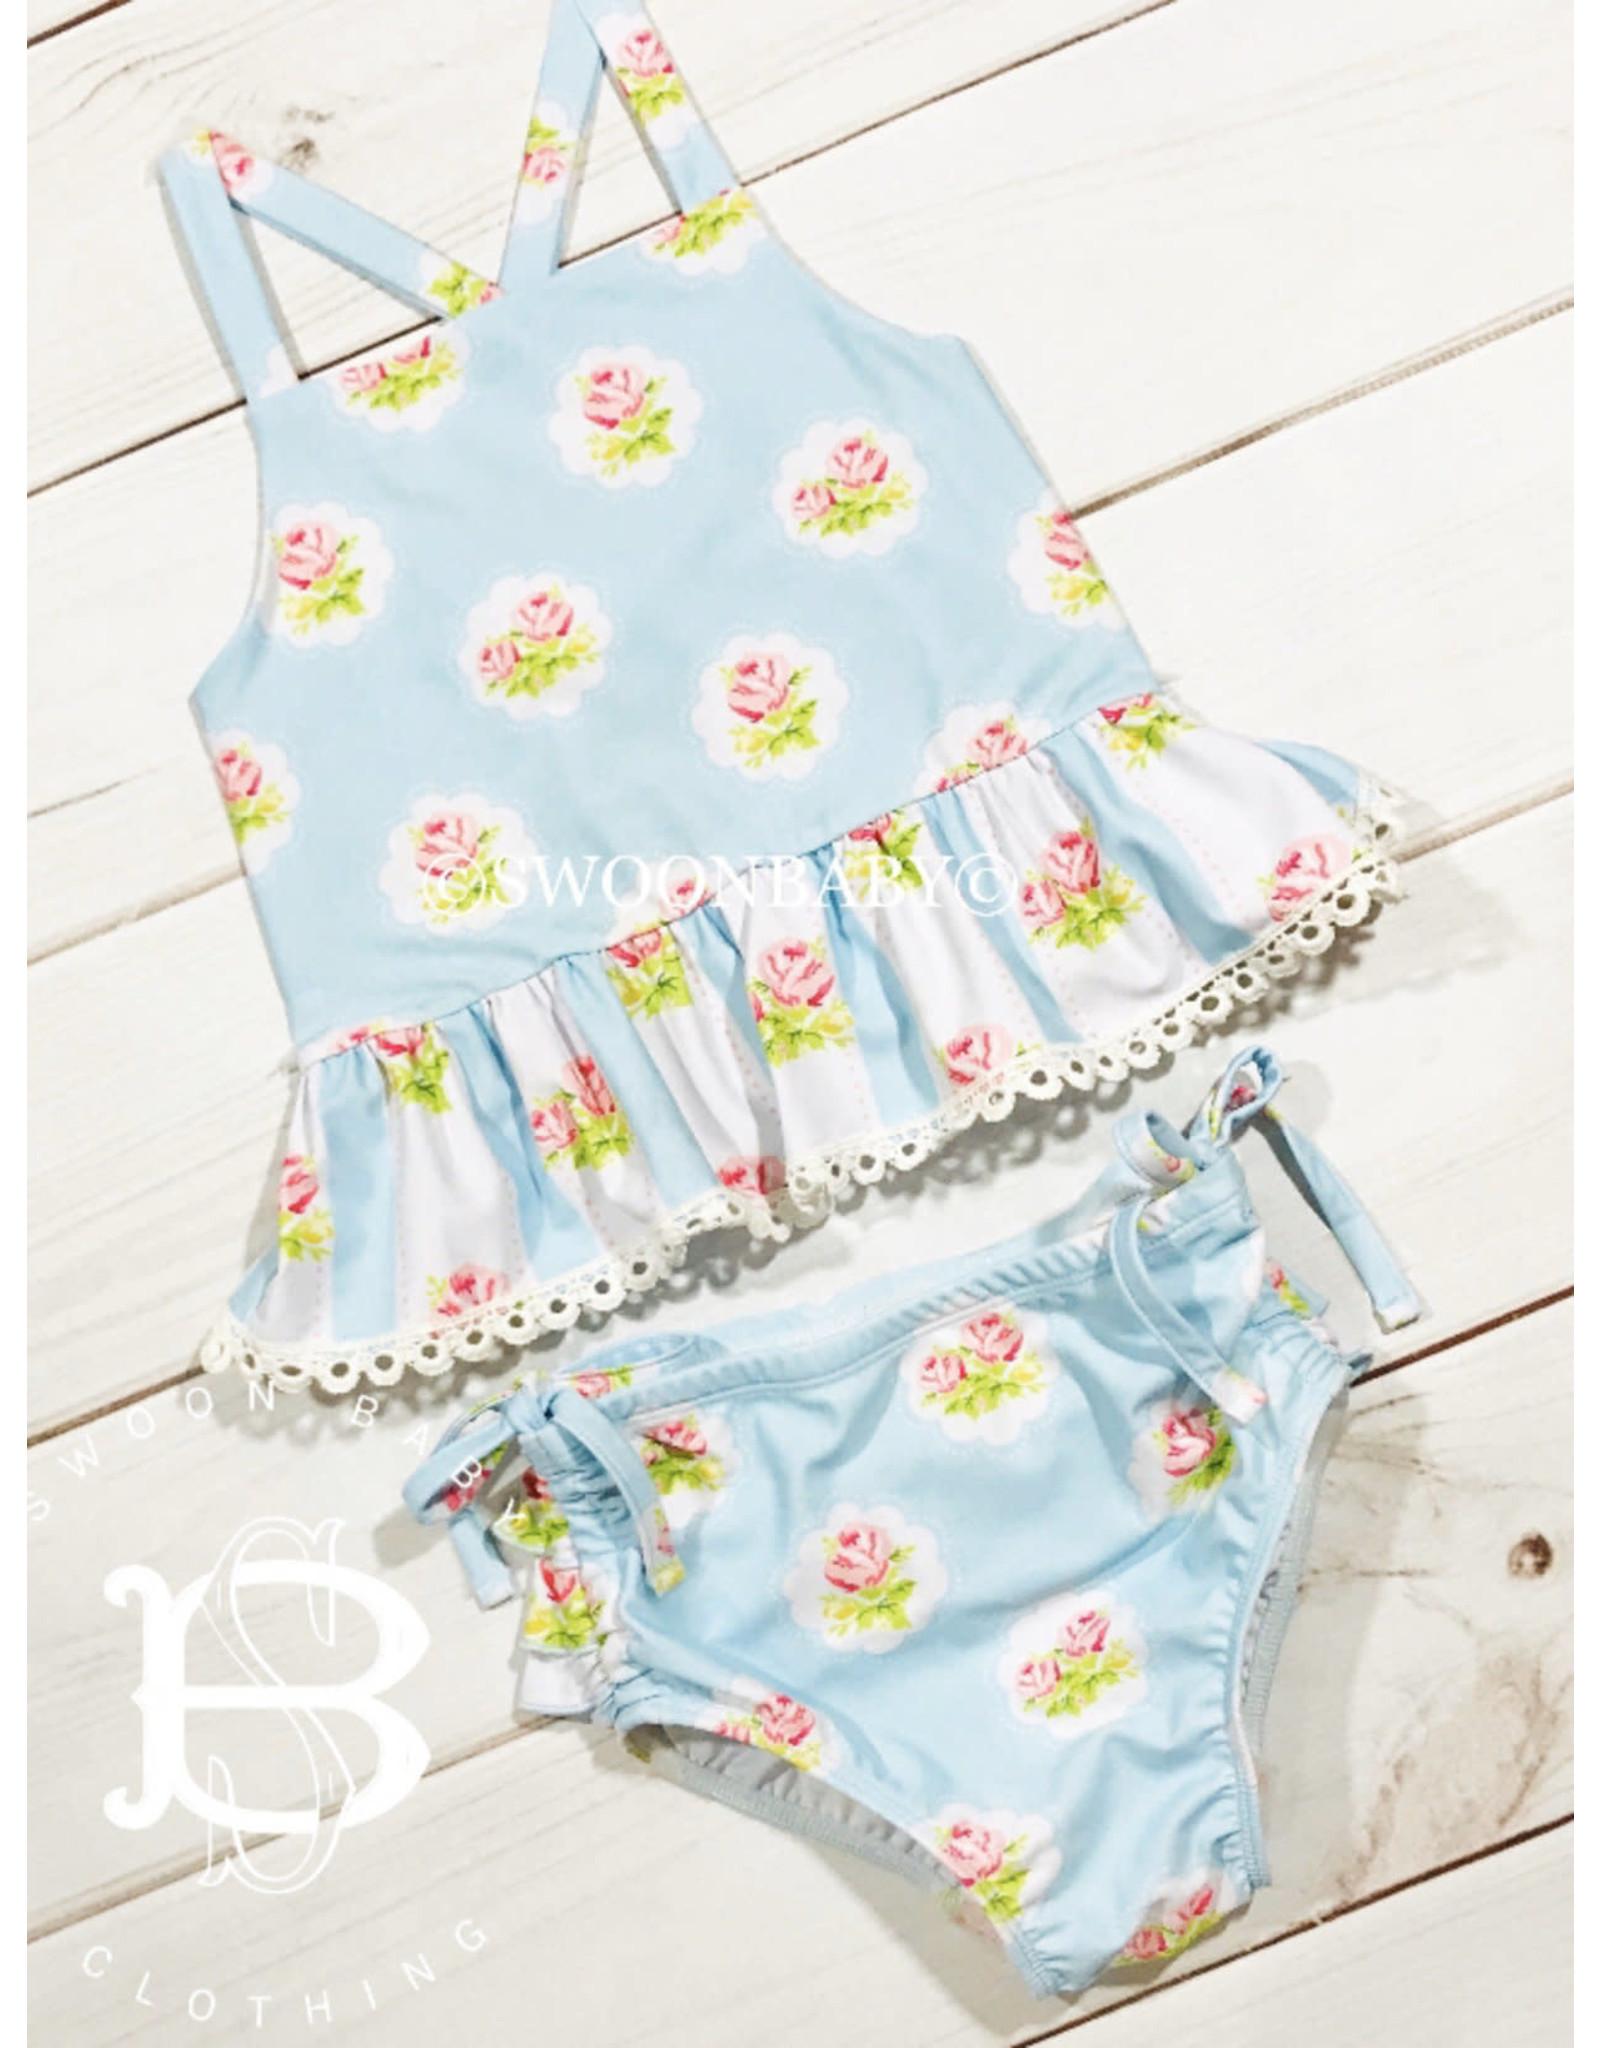 Swoon Baby Swoon Baby- Prim Rose 2PC Swim- Size 5